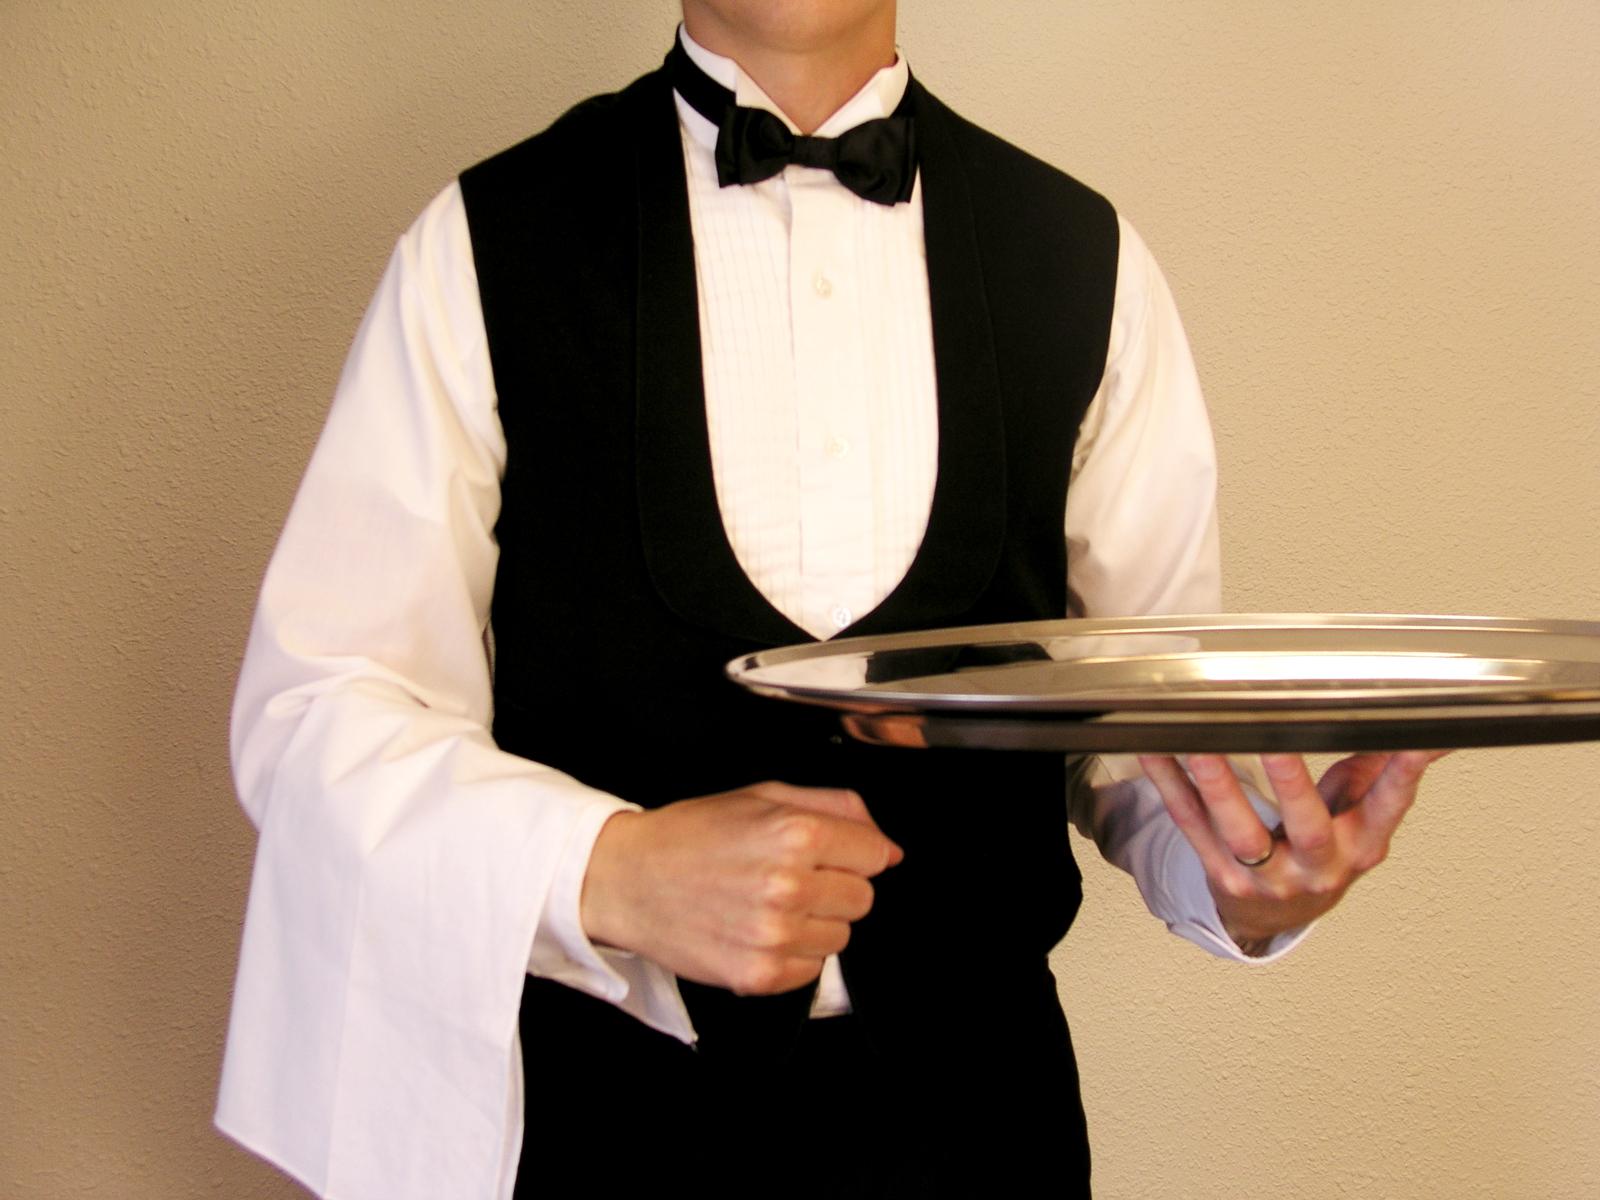 Job Description For An Upscale Restaurant Waiter